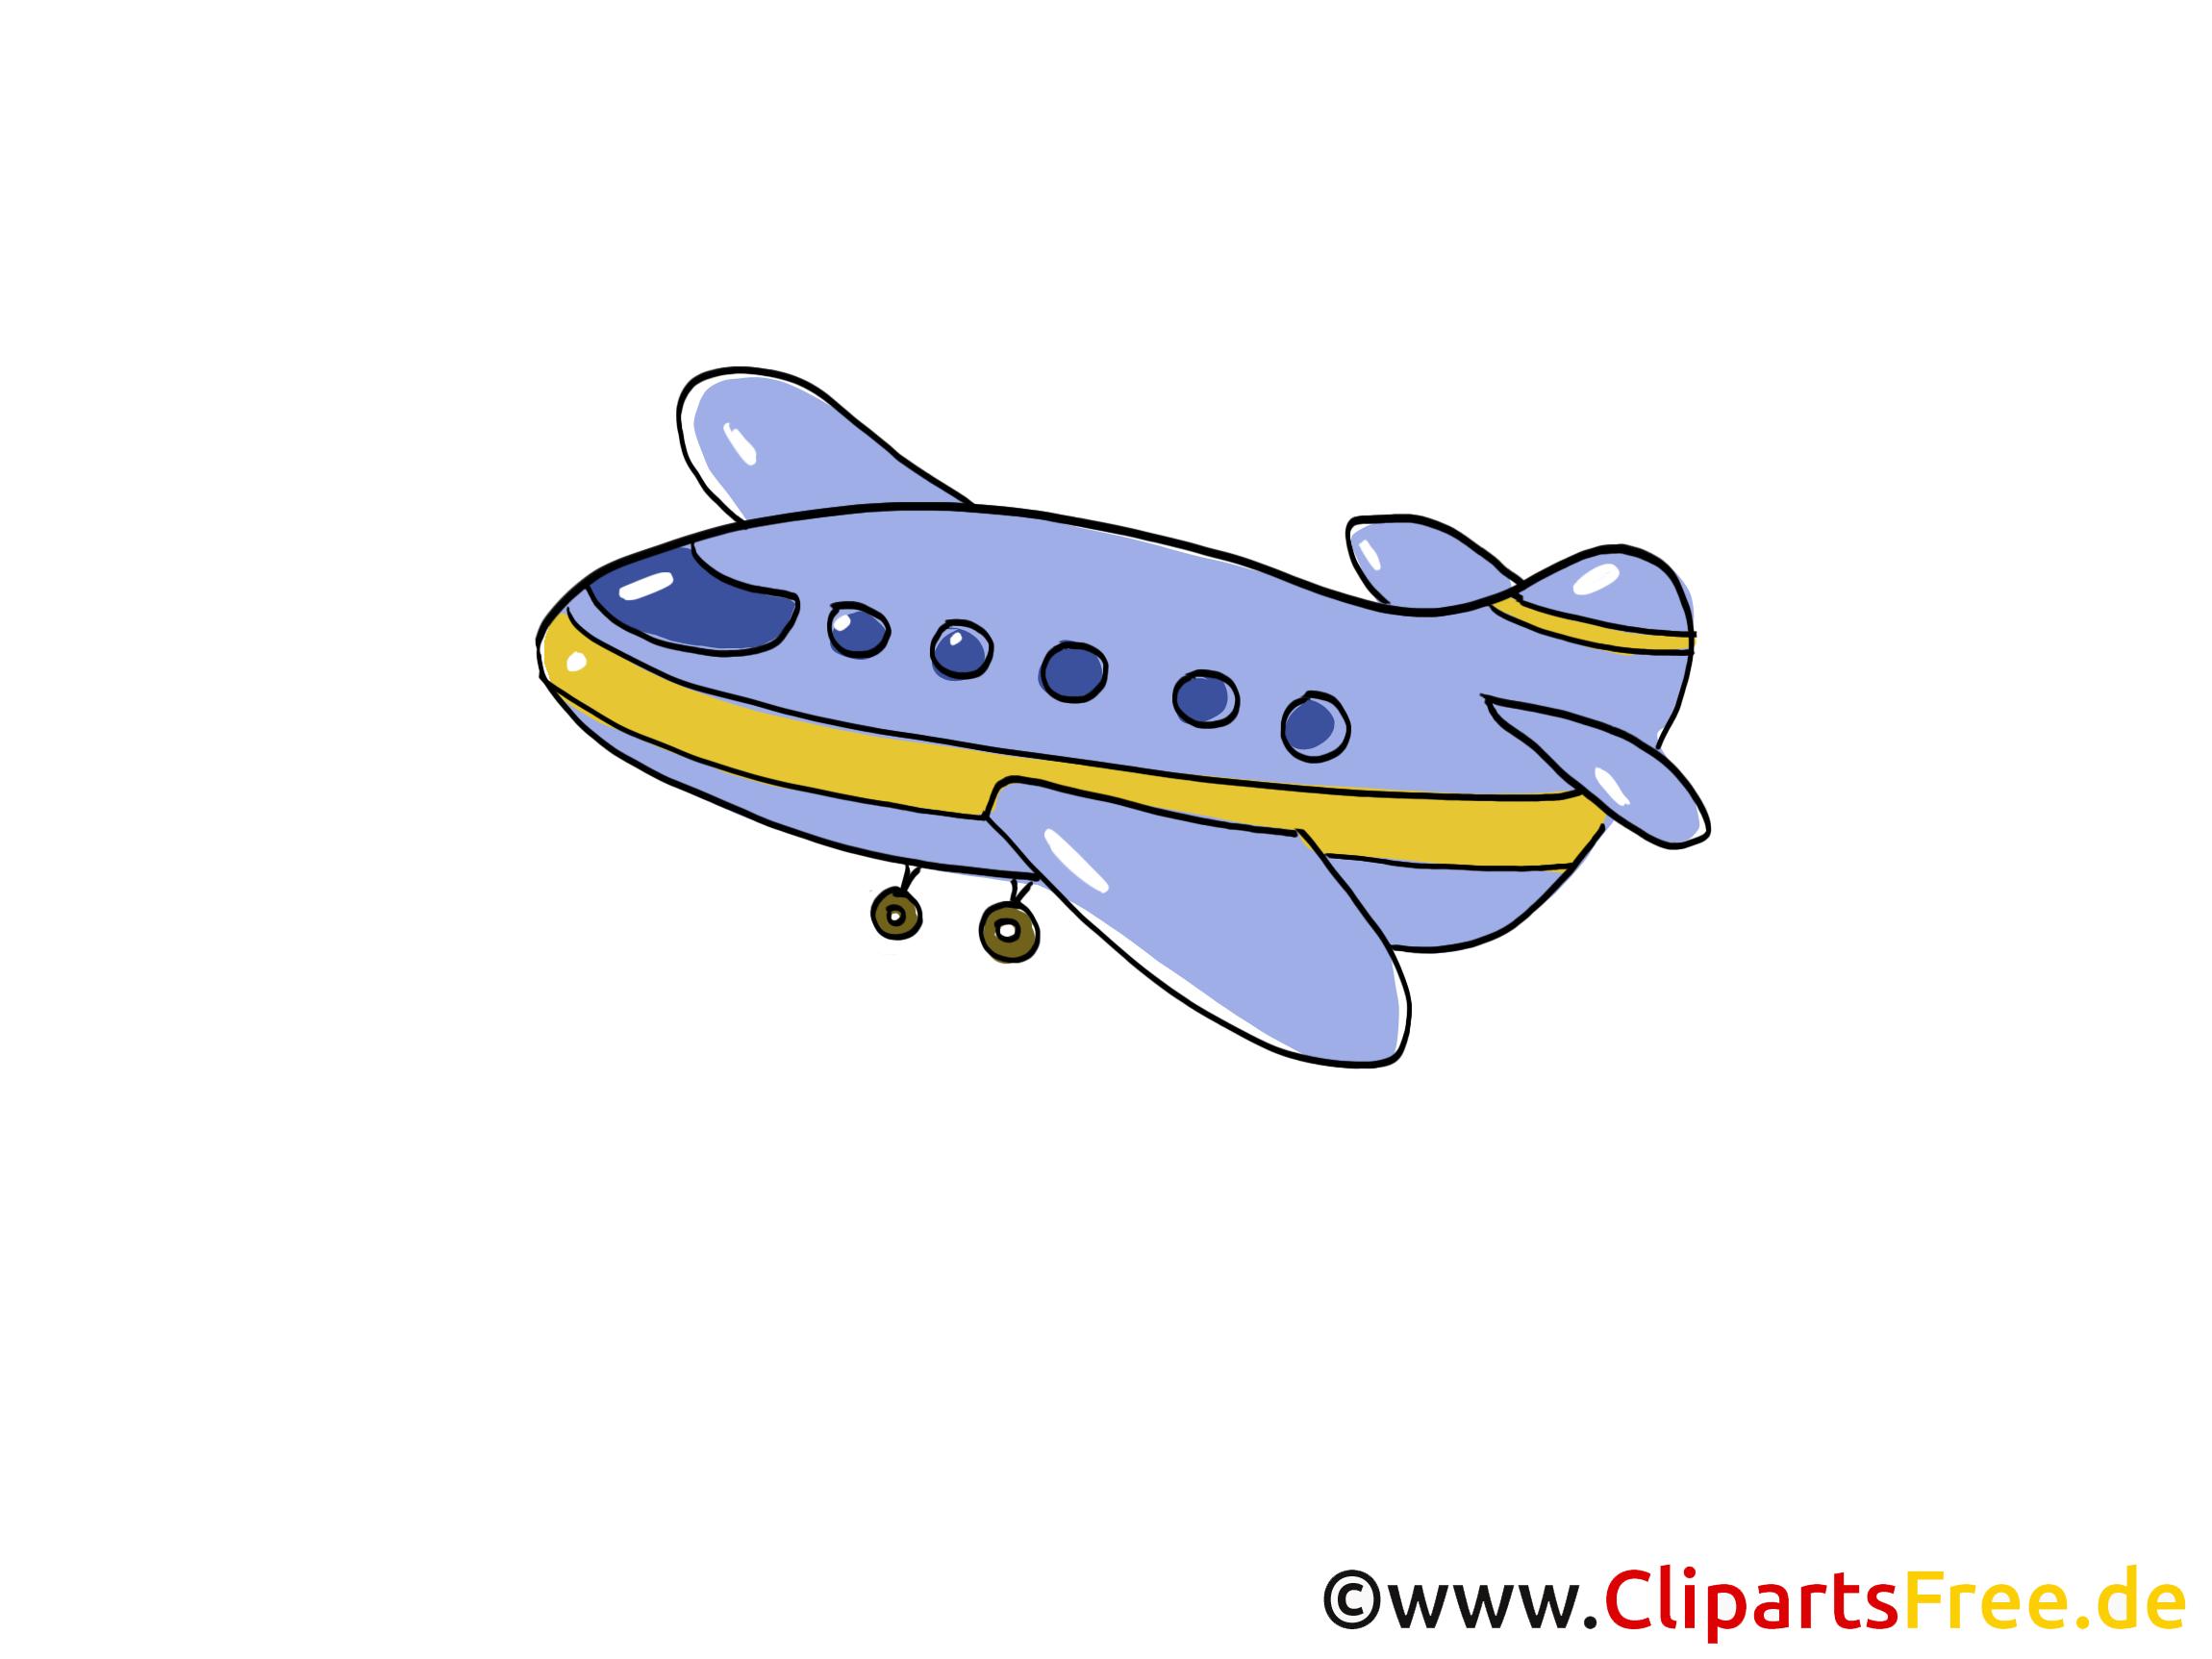 Avion clipart 3 » Clipart Station.